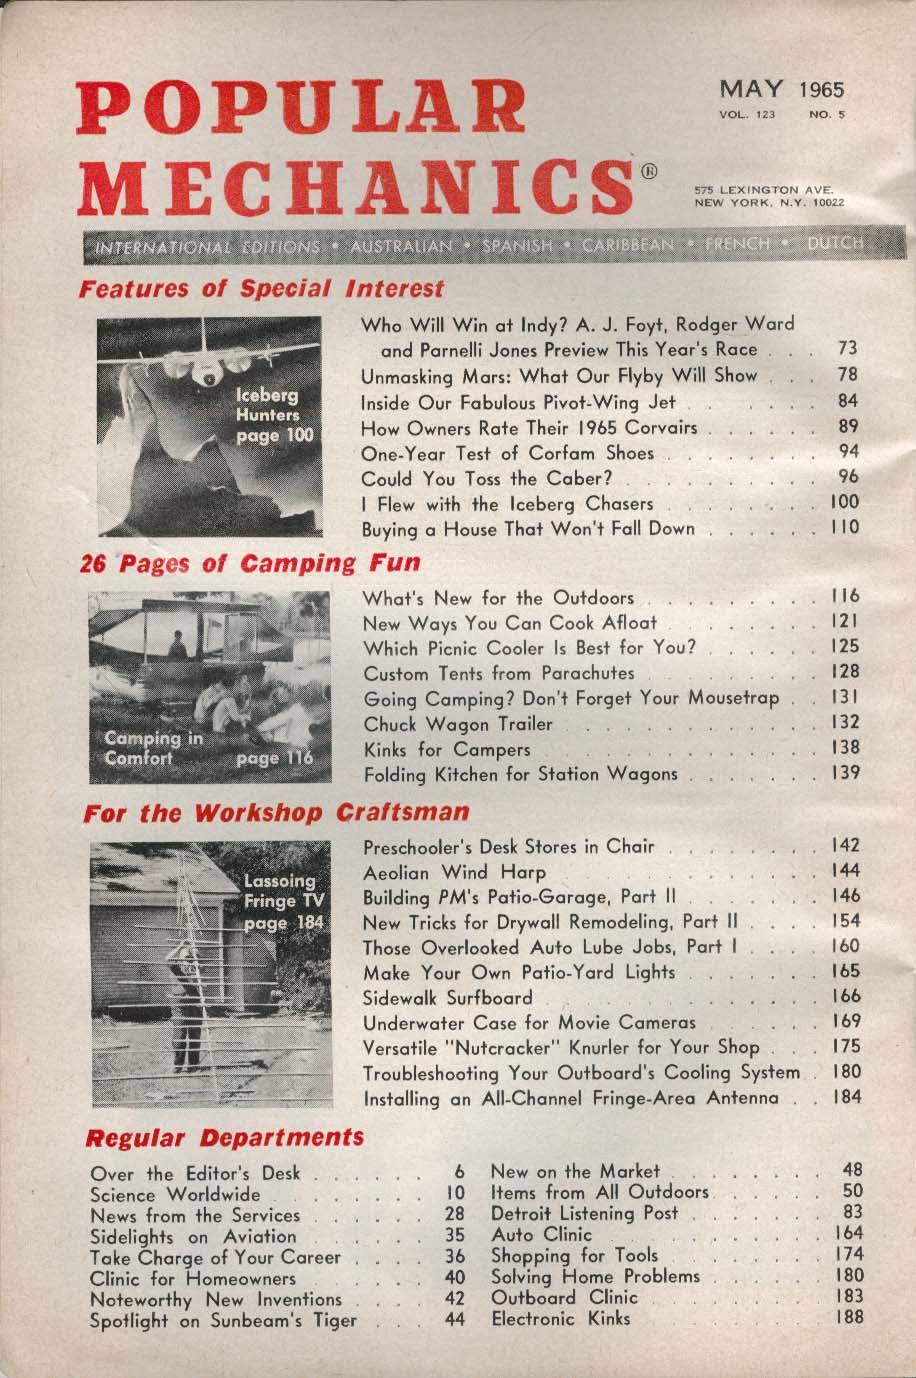 POPULAR MECHANICS Foyt Ward Jones Indy Corvair Corfam Shoes Mars Flyby ++ 5 1965